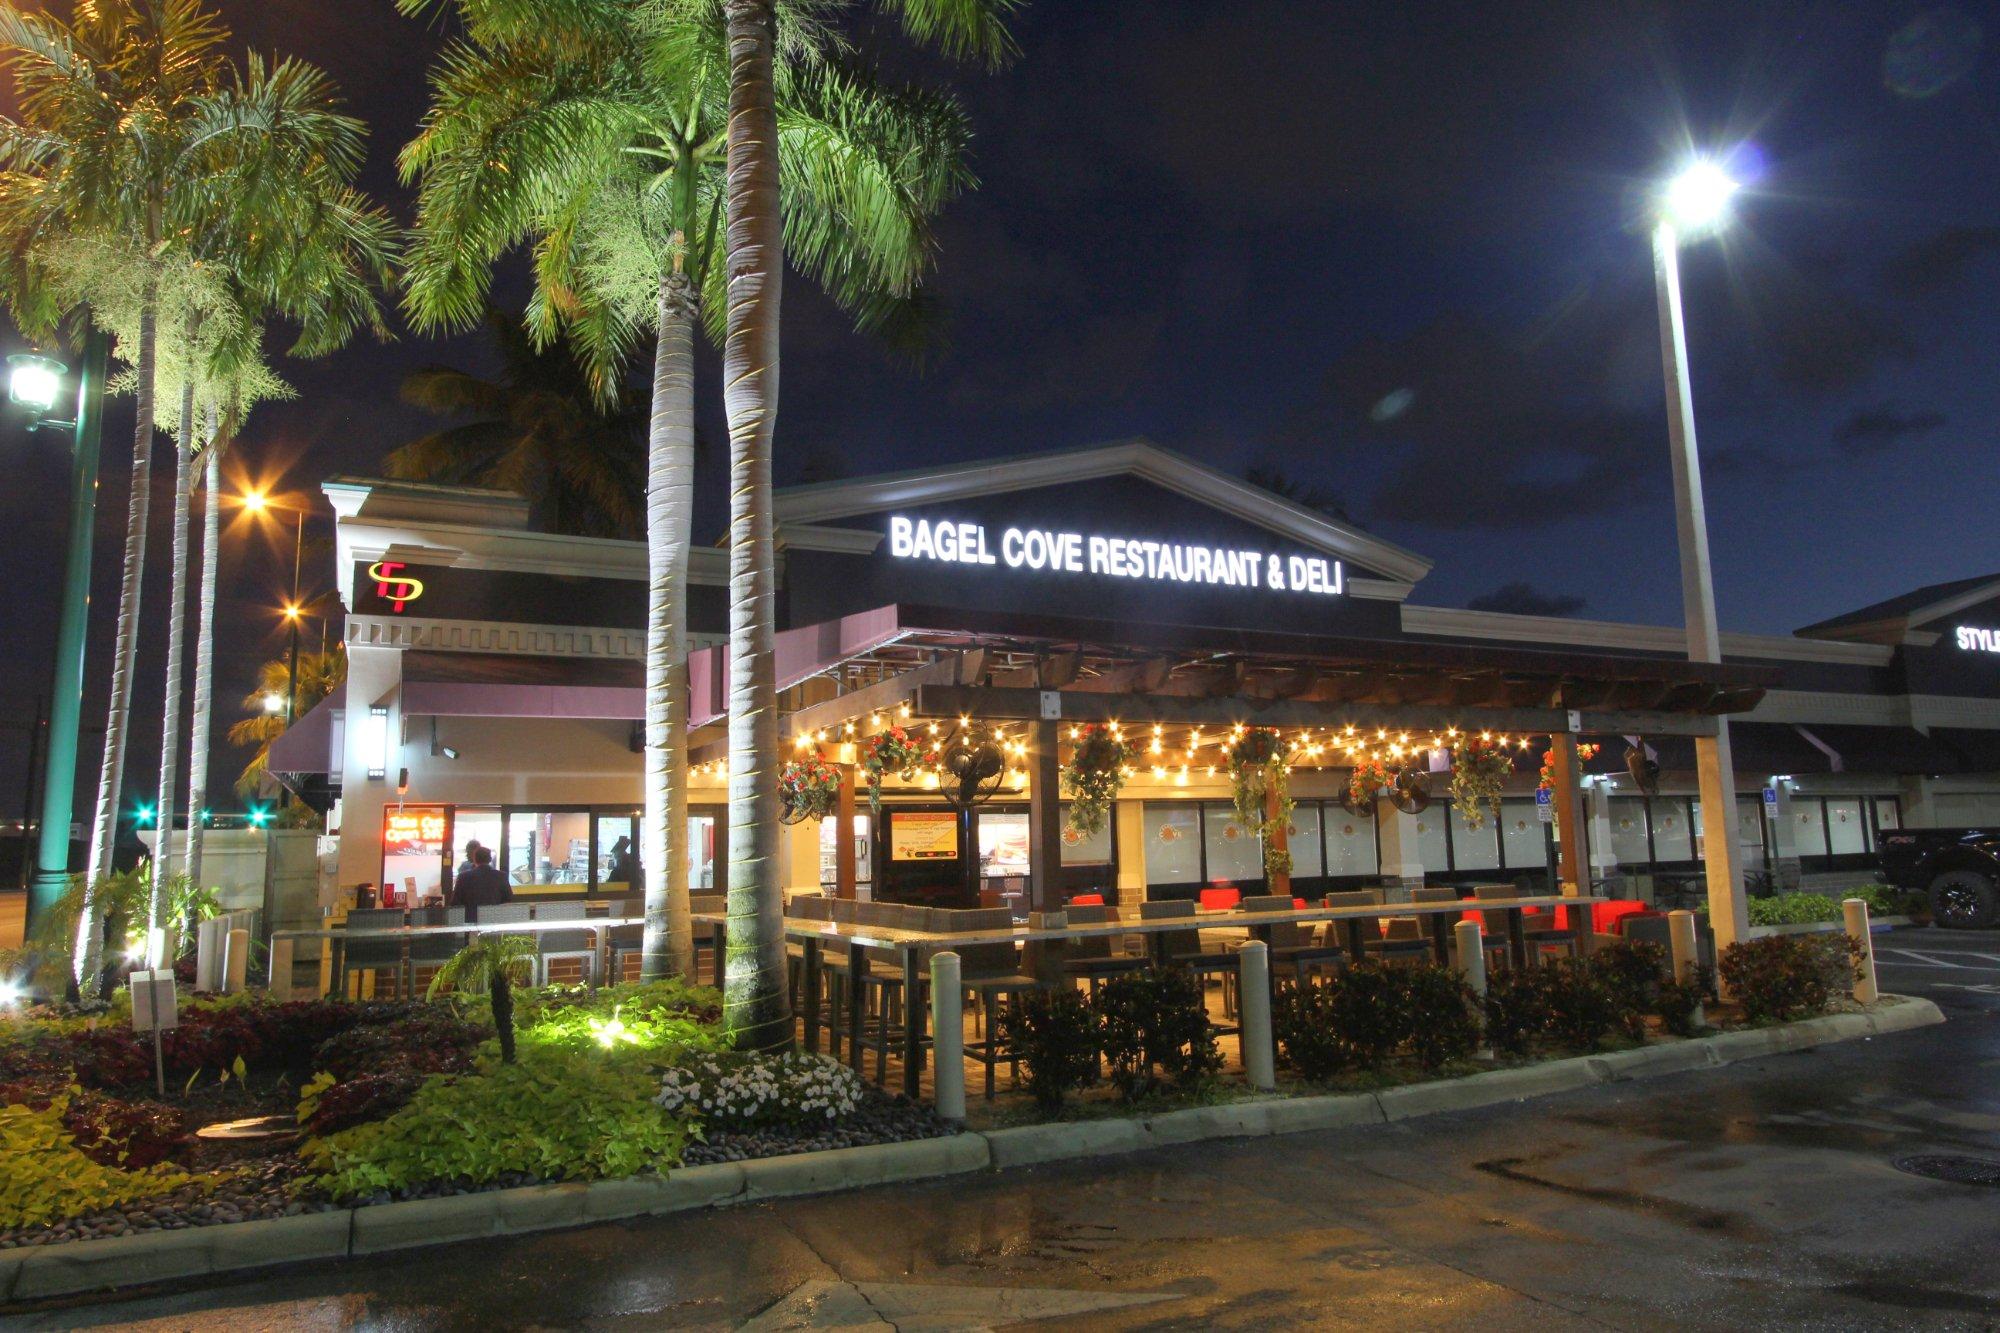 Bagel Cove Restaurant